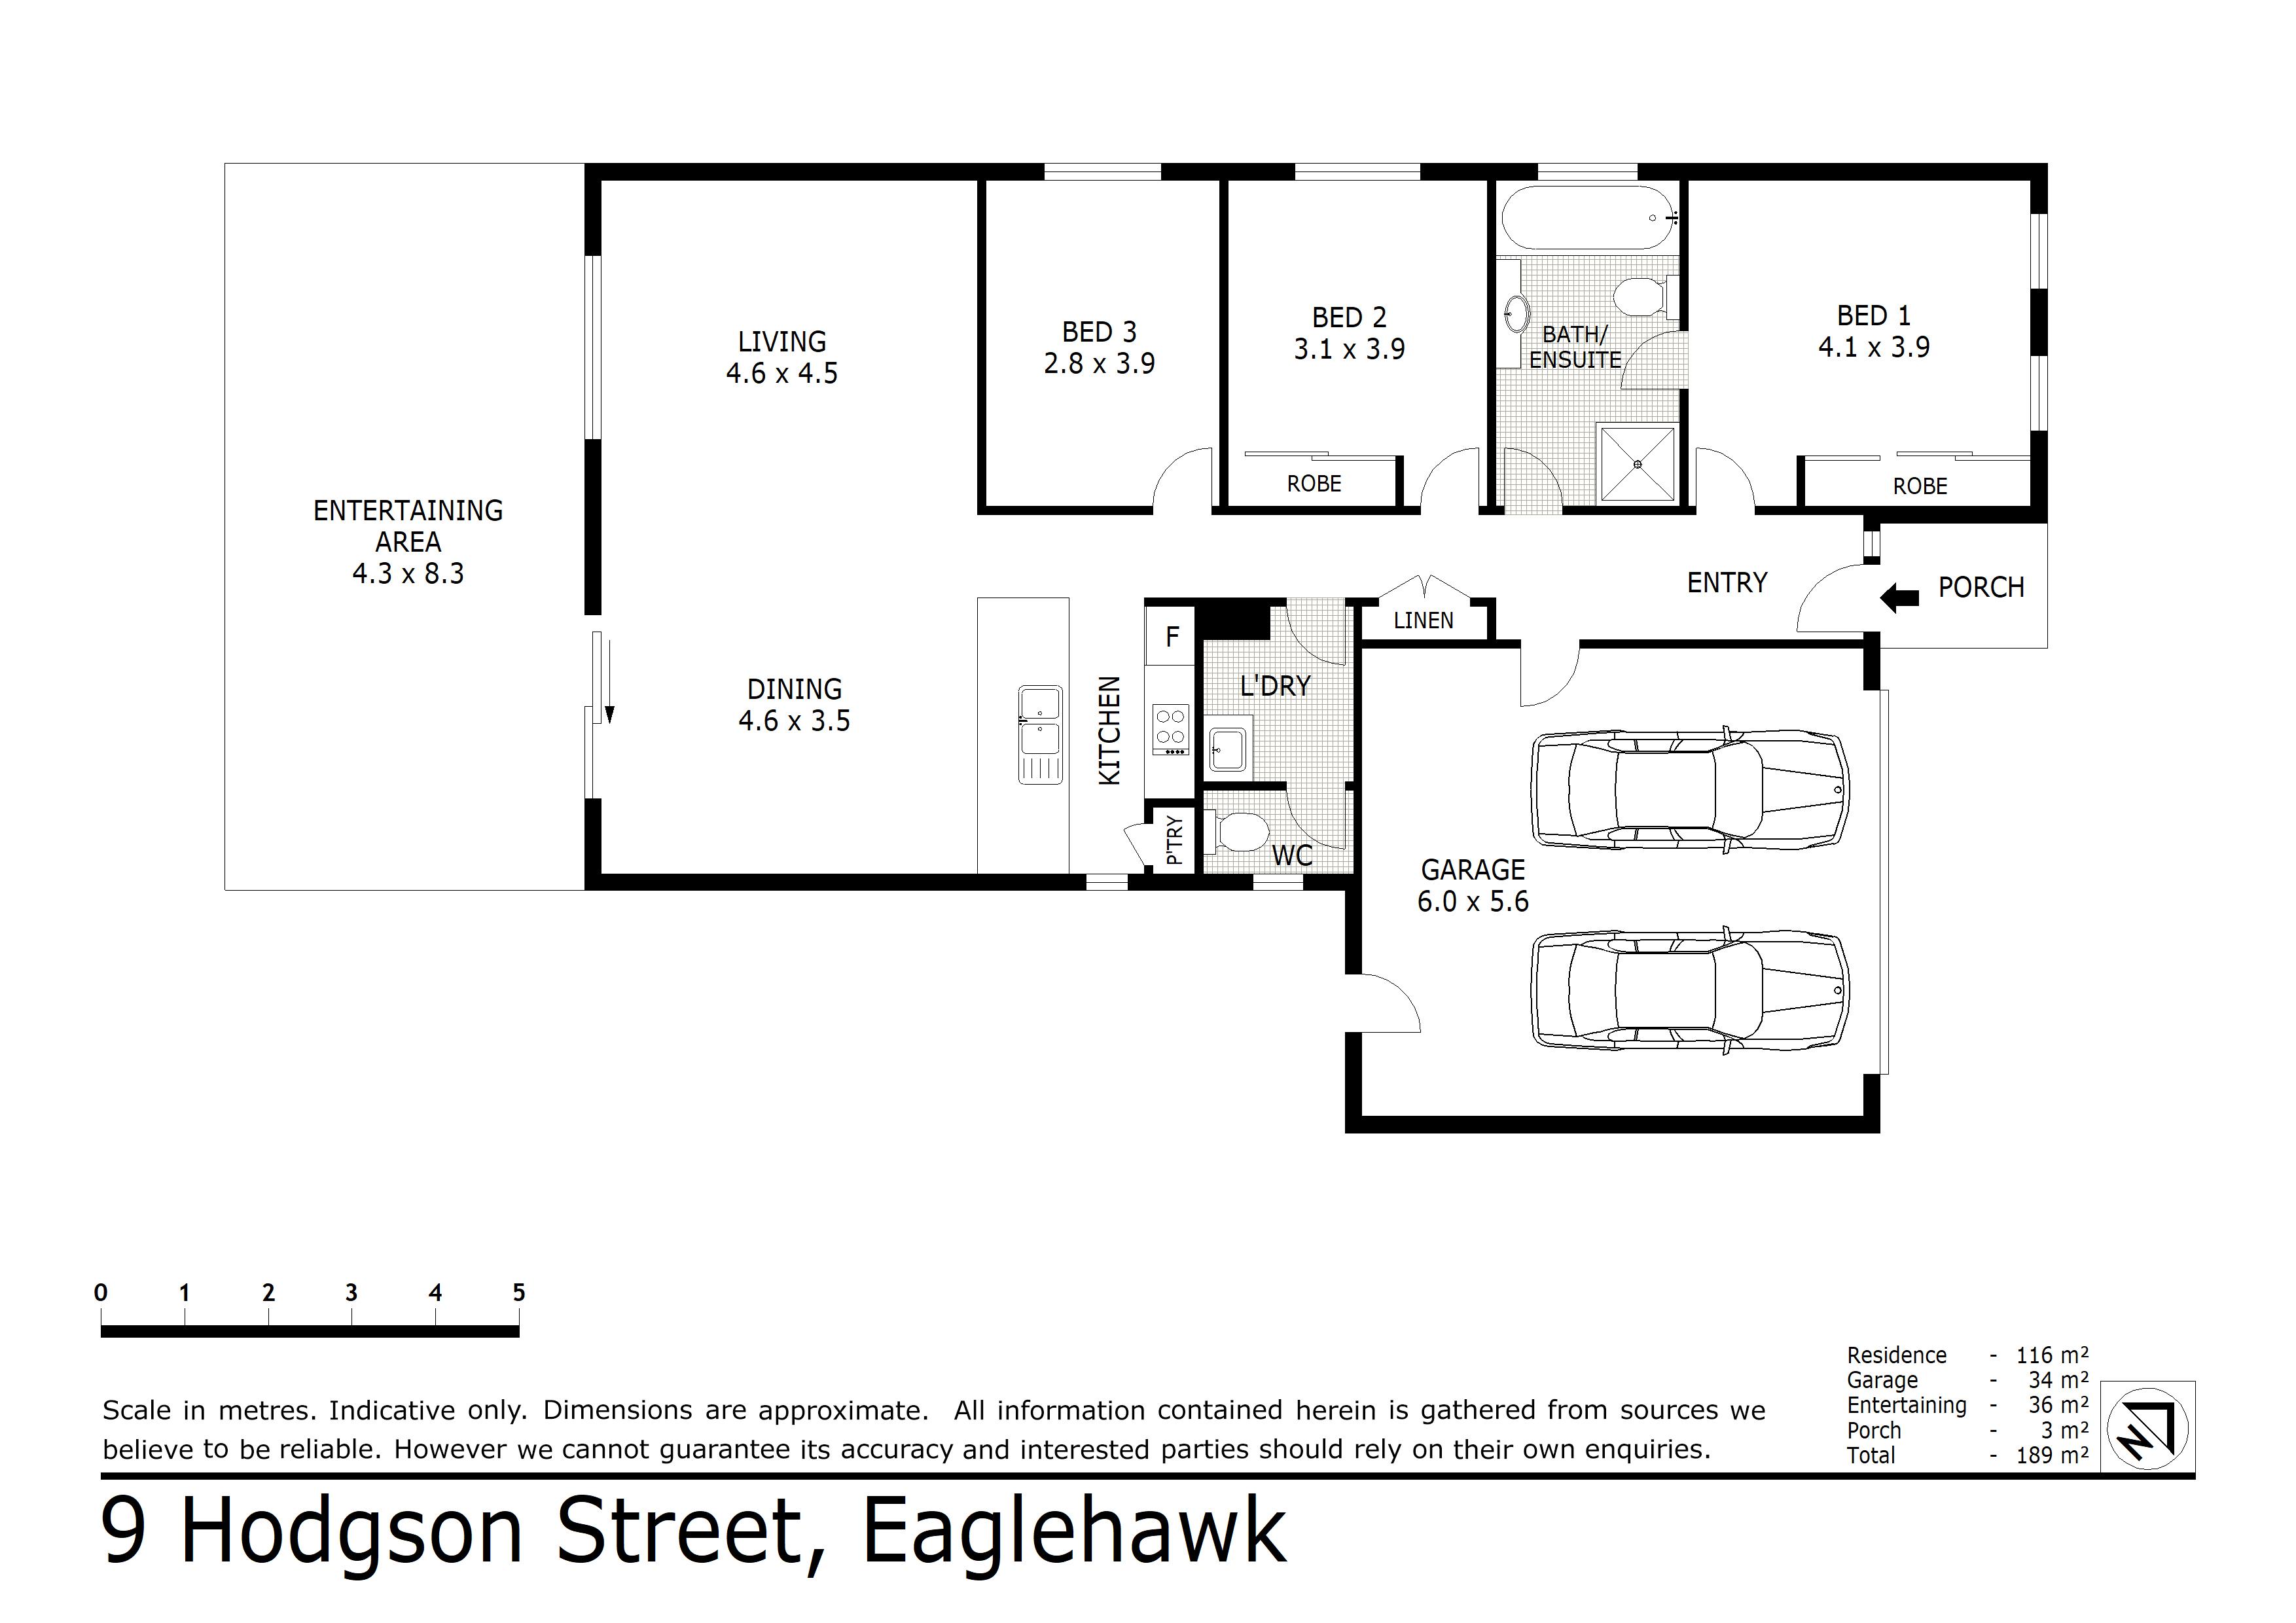 9 Hodgson Street, Eaglehawk, VIC 3556